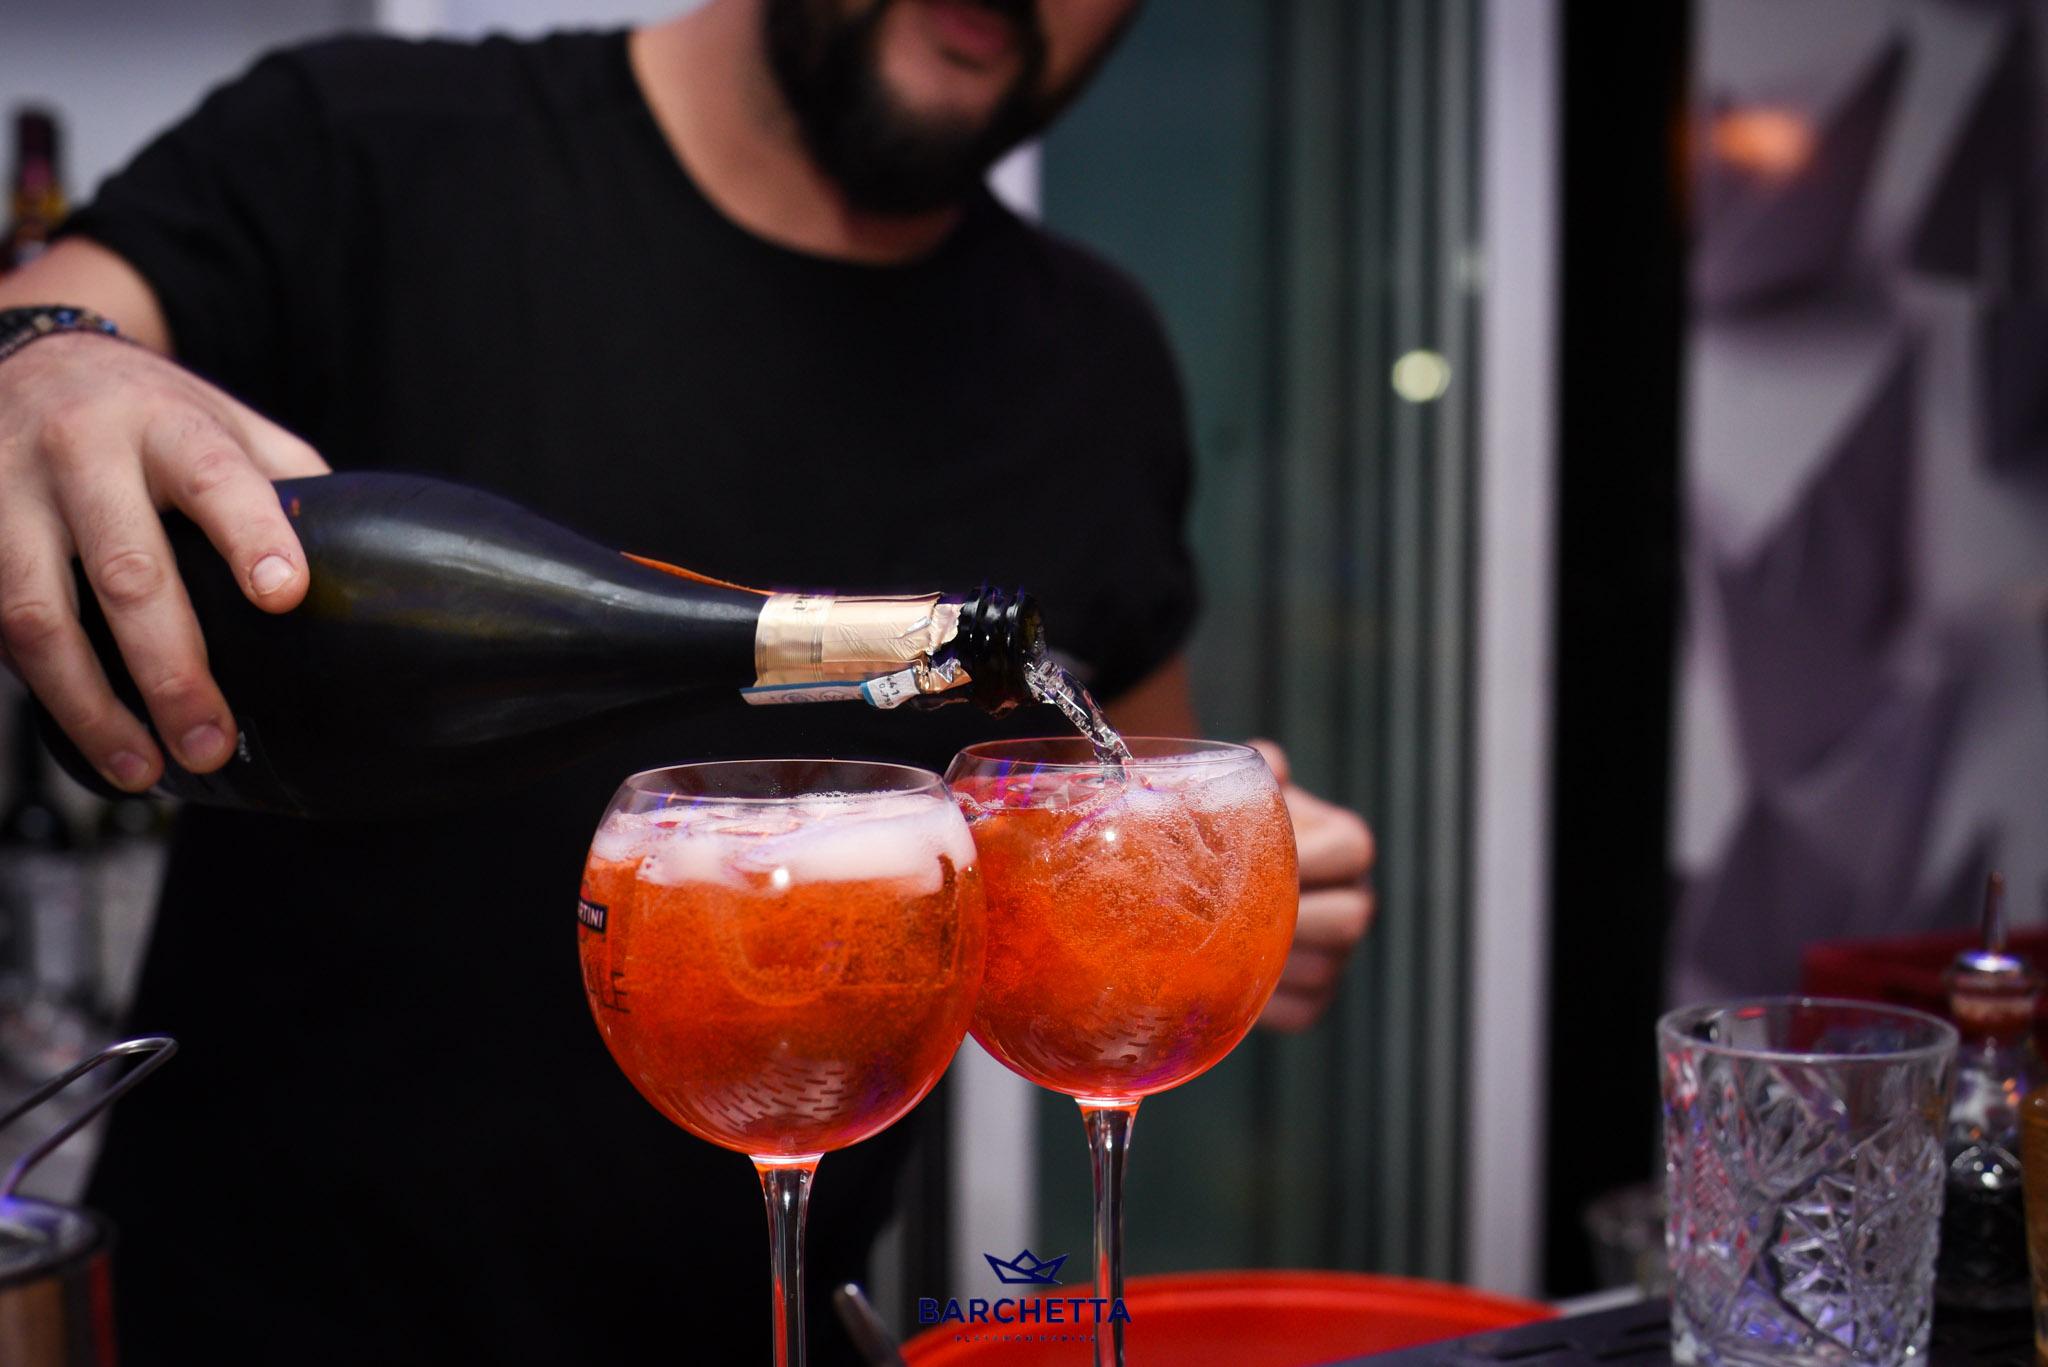 DSC 7103 - Barchetta | Σάββατο 5.8.2017